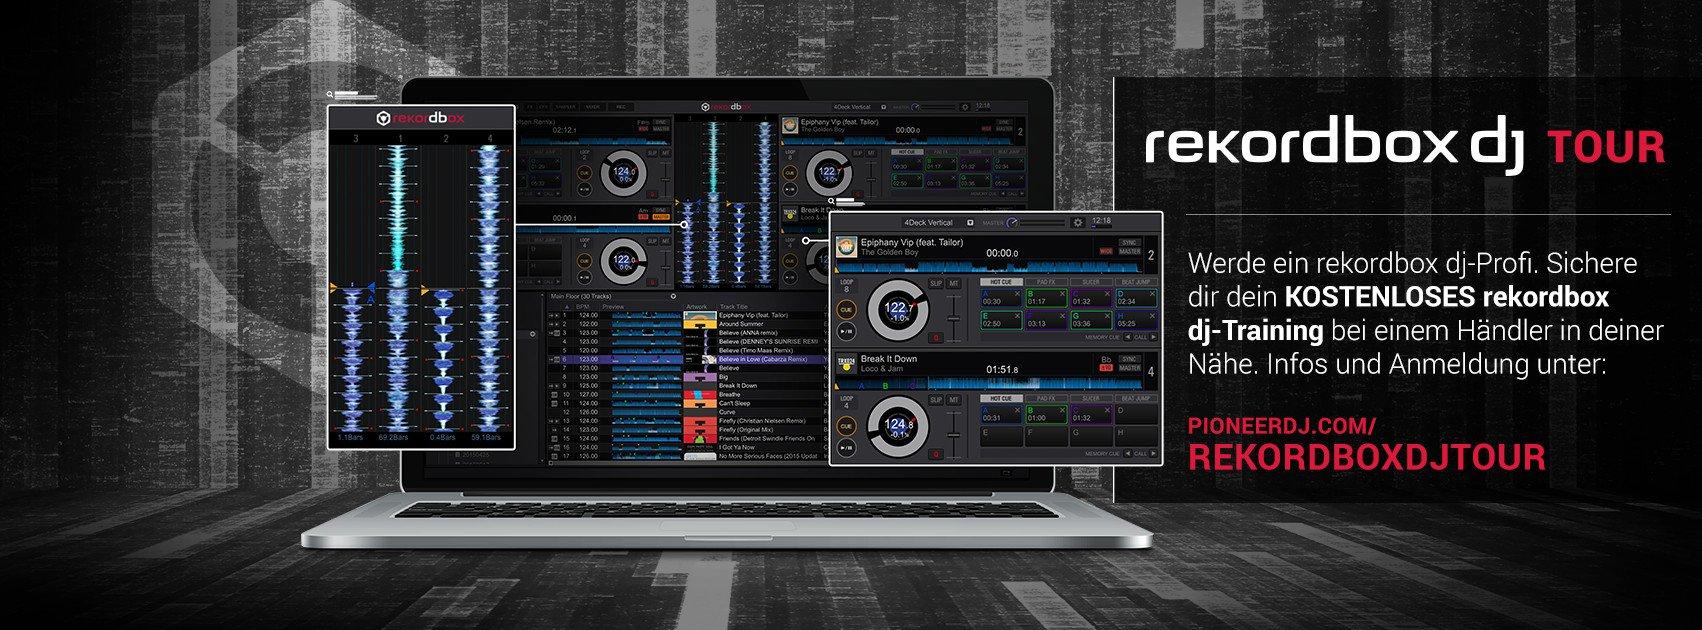 Rekordbox DJ Workshop Tour 2015